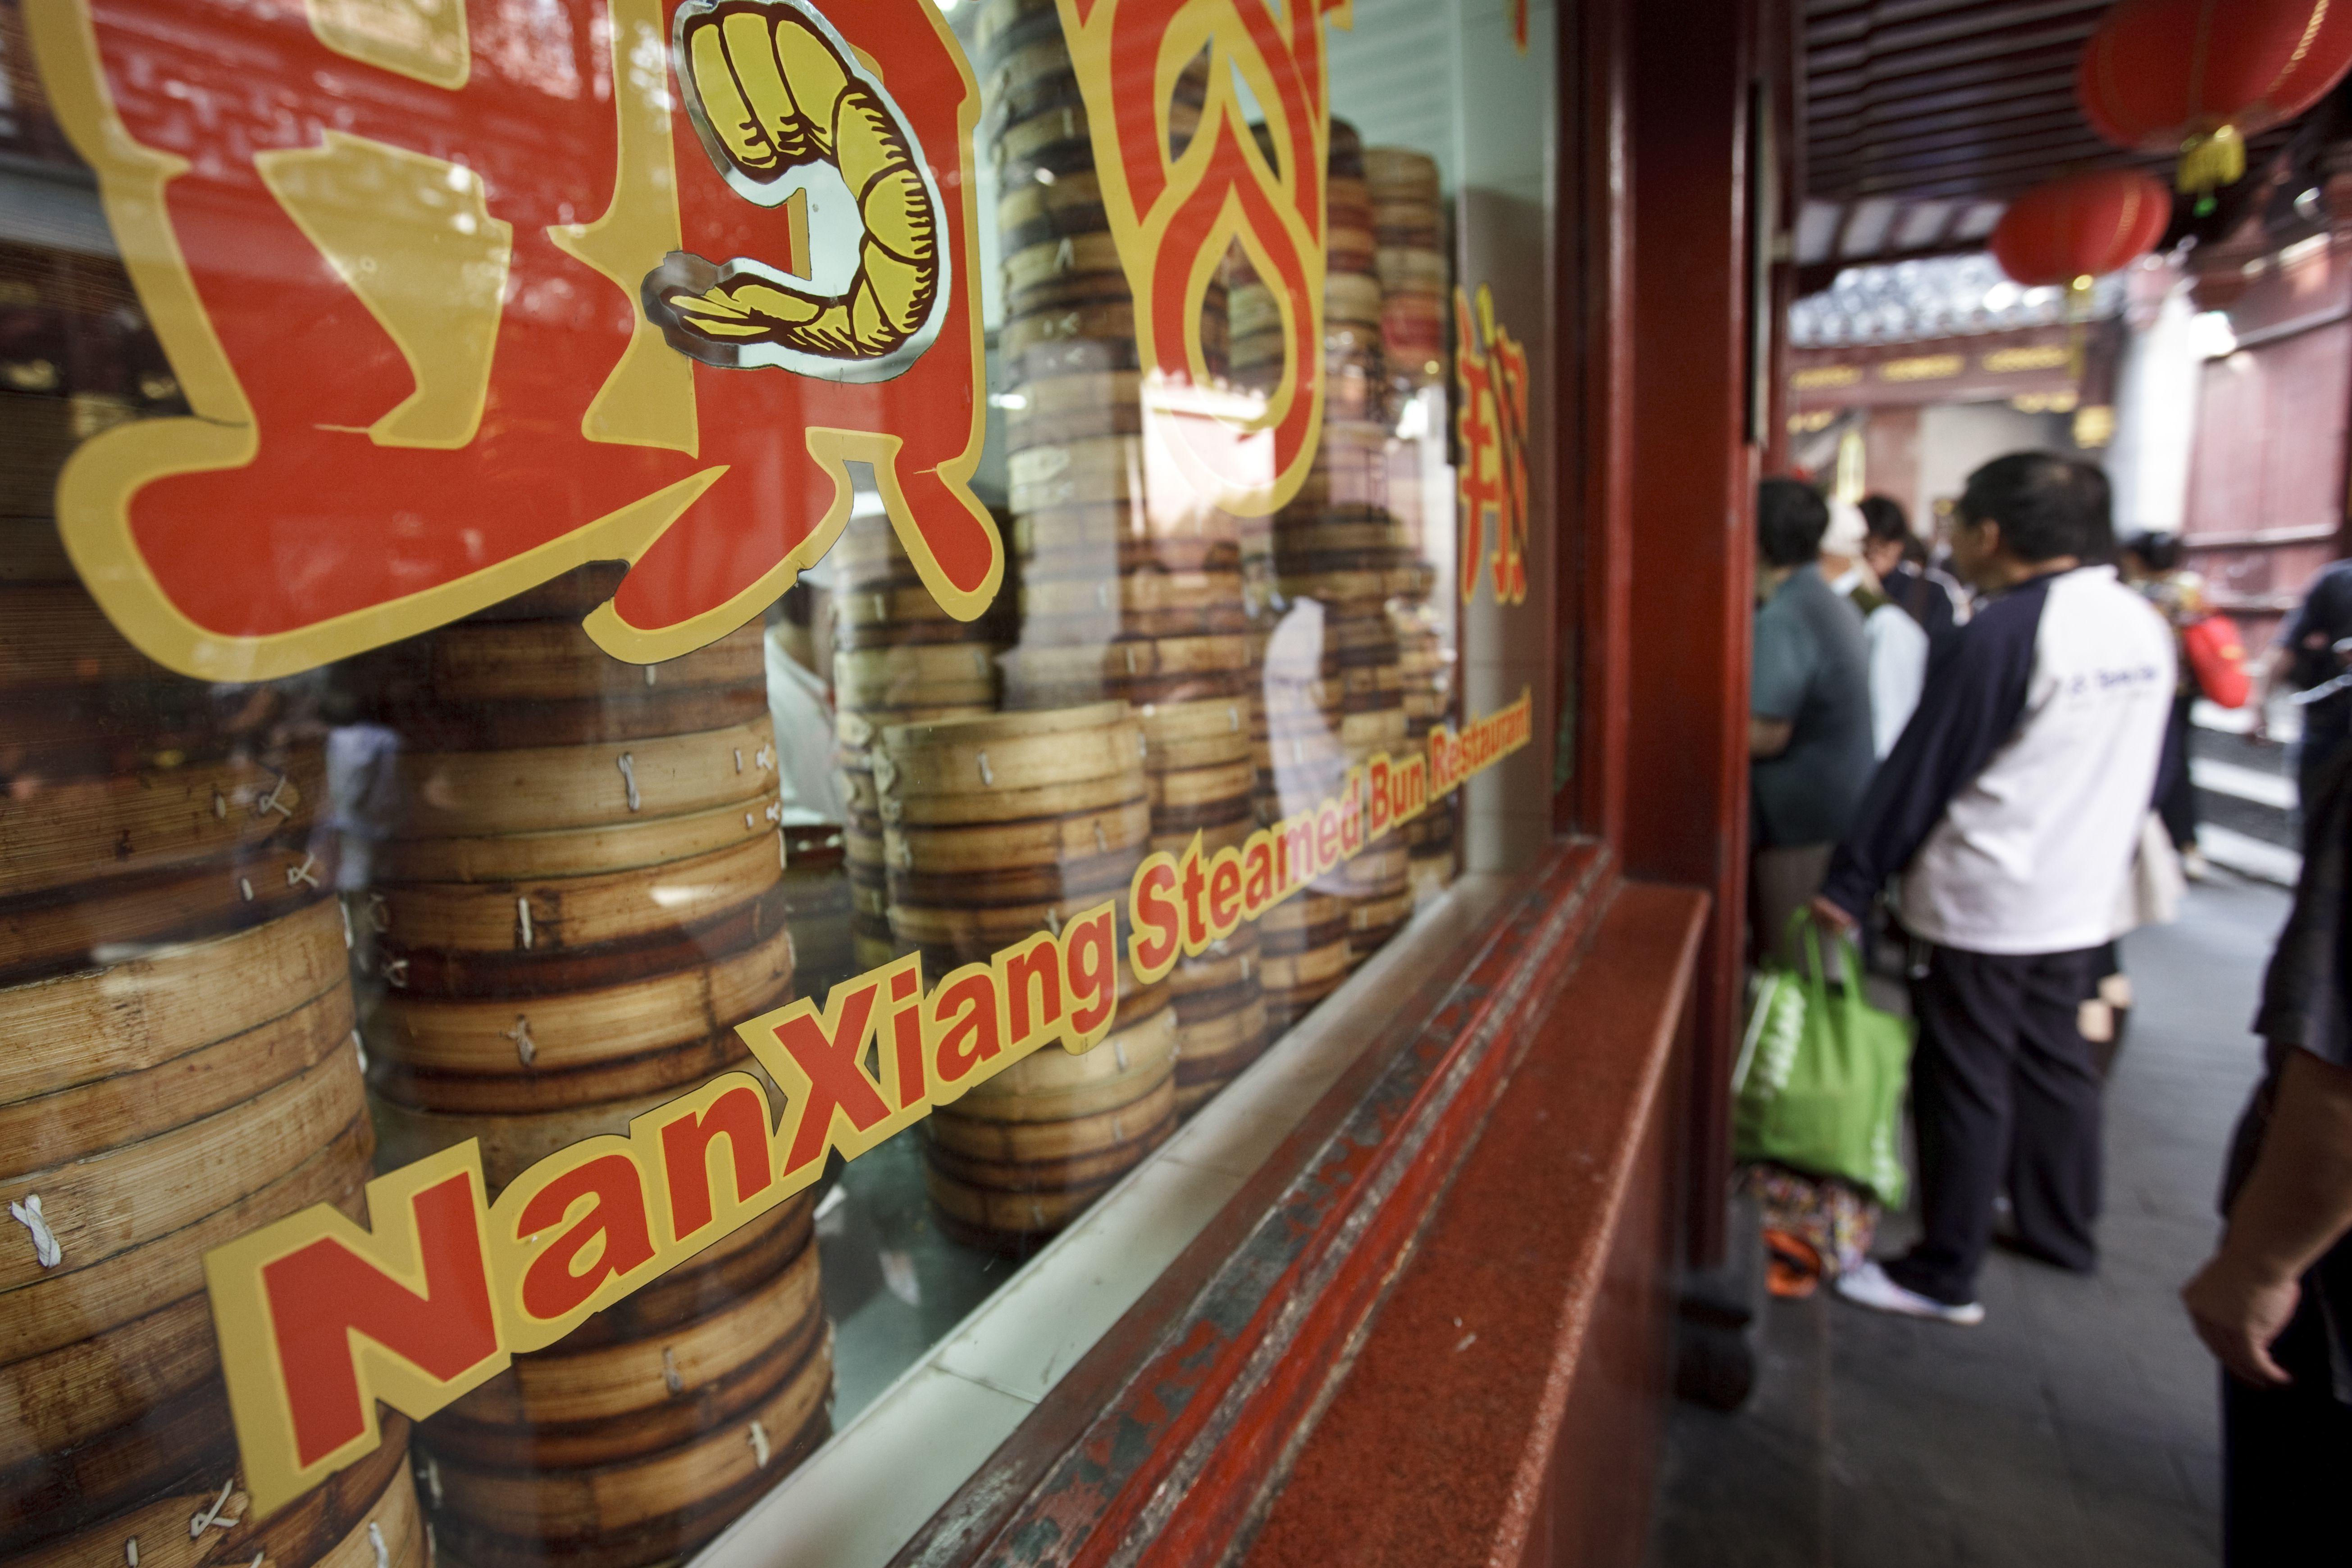 Nan Xiang Steamed Bun Restaurant in the Yuyuan Garden